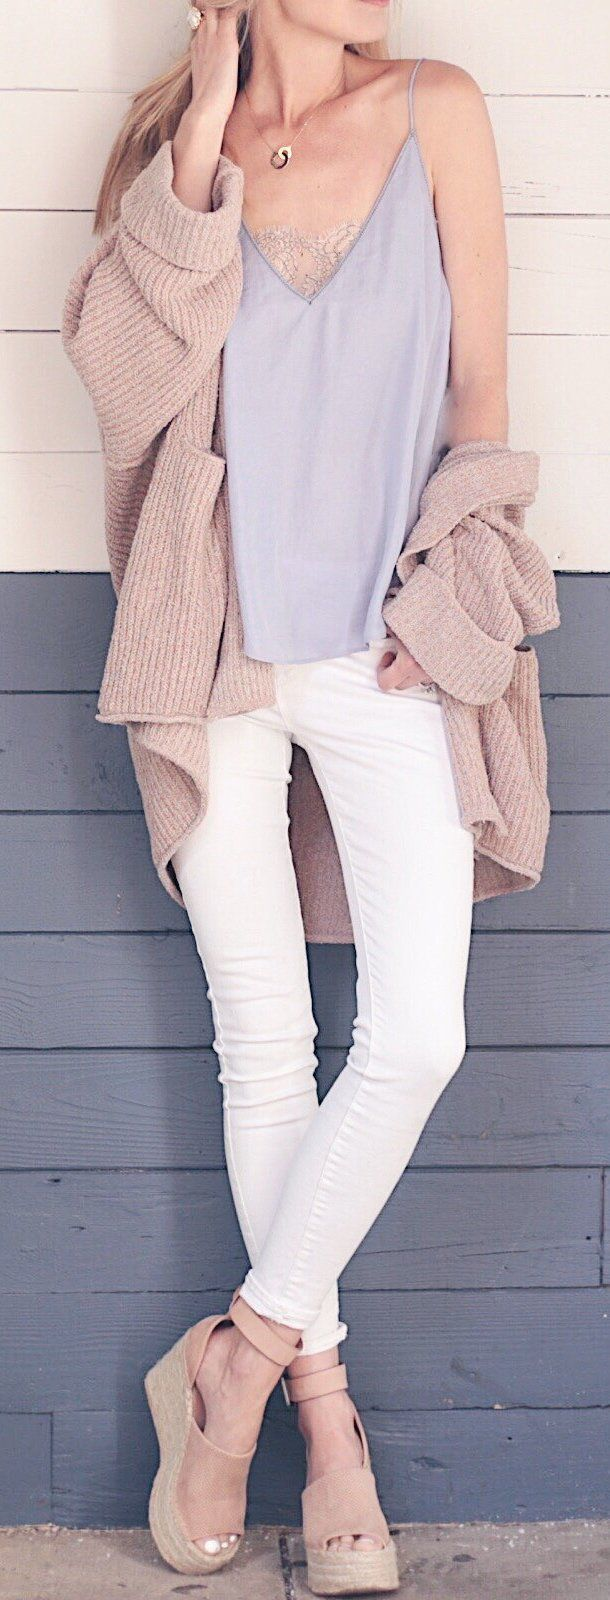 #spring #outfits /  Beige / Grey Top / White Skinny Jeans / Beige Platform Sandals